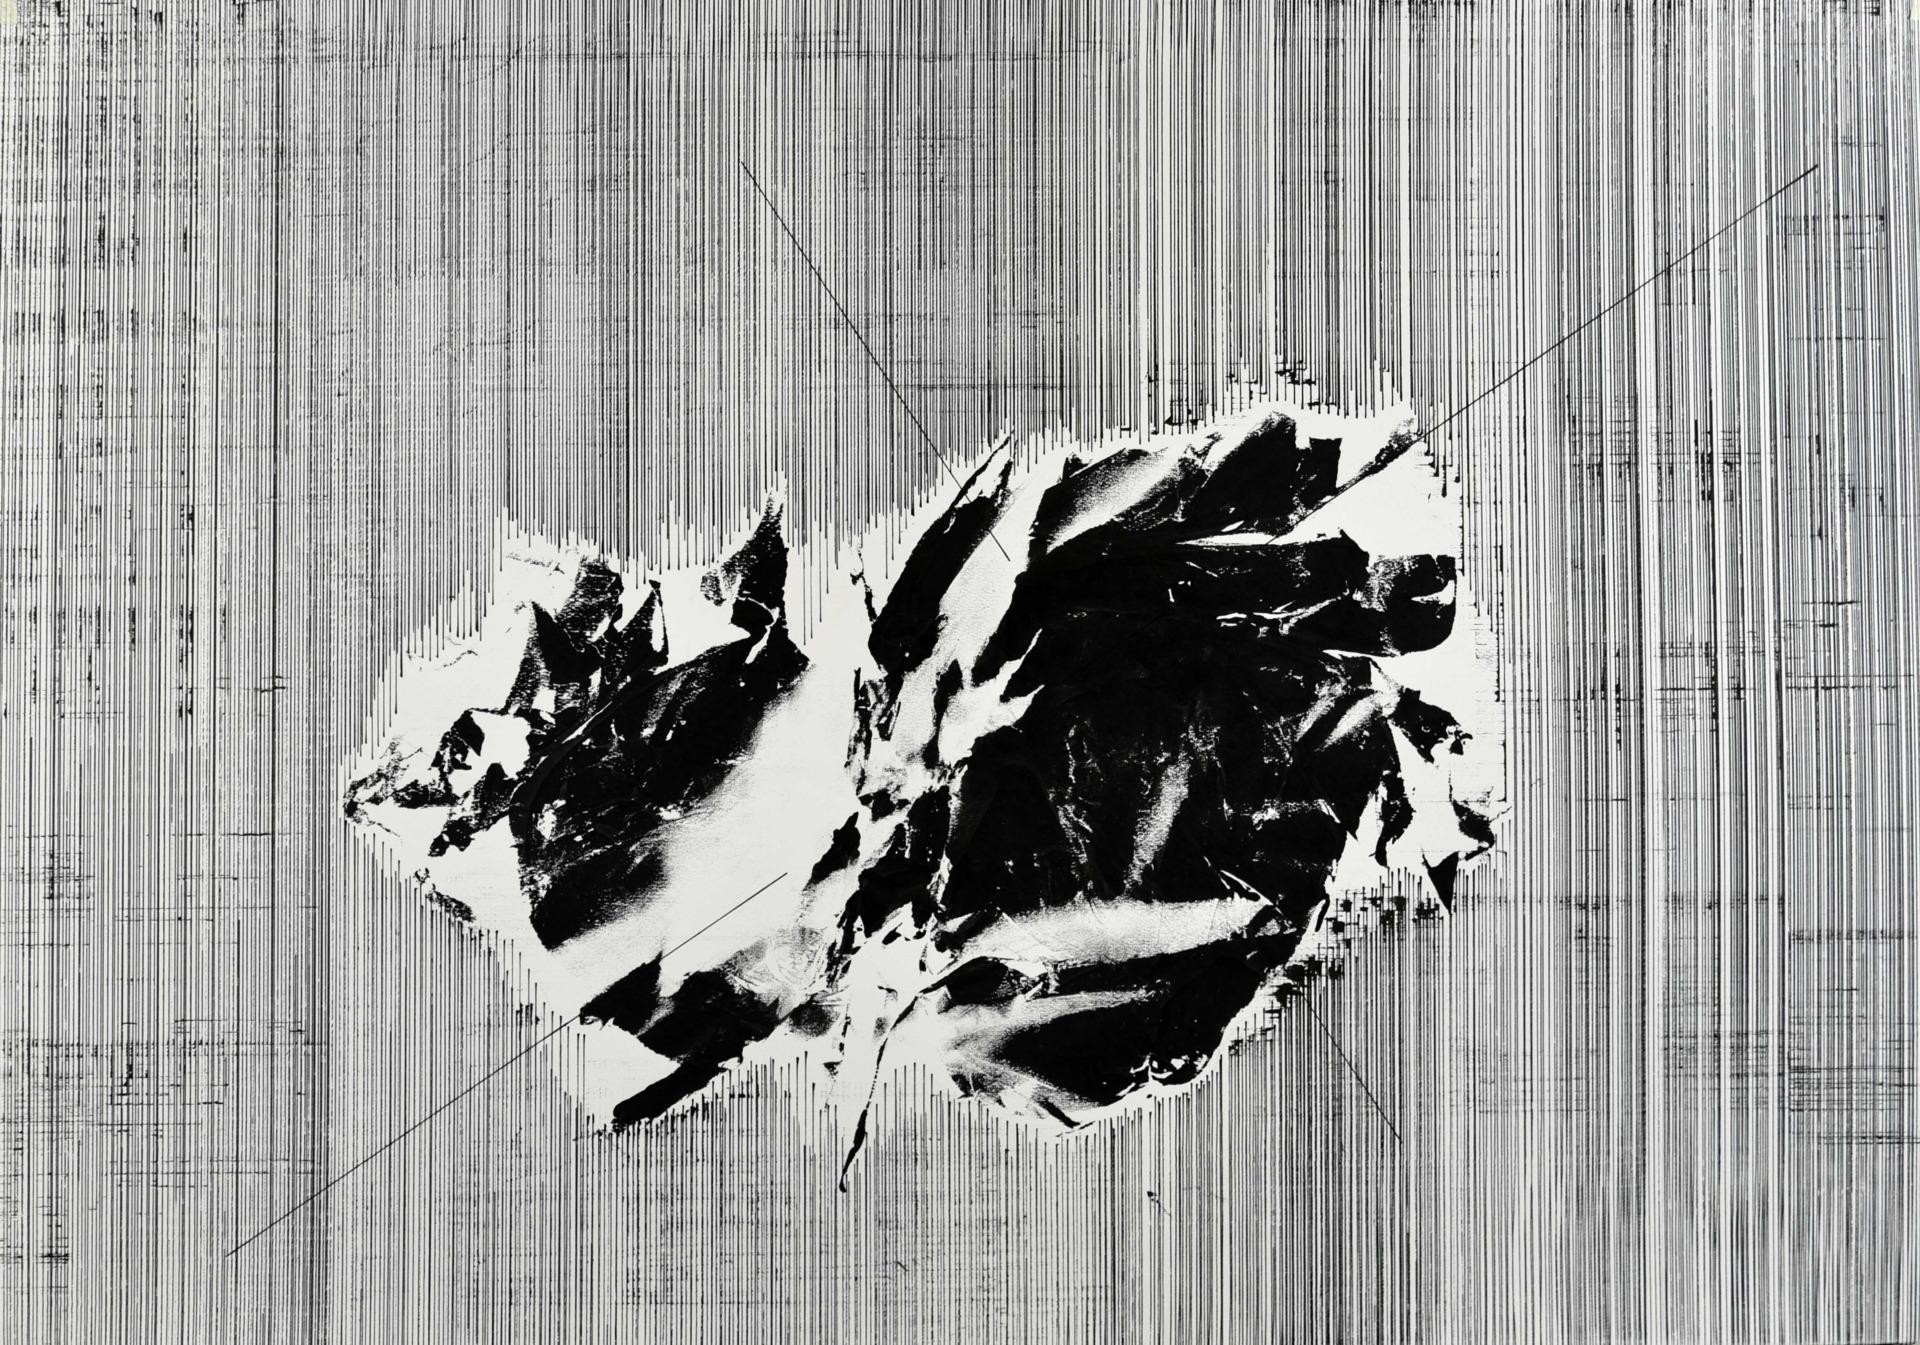 Contemporary art from Gyula Sági | Op.110221. 2